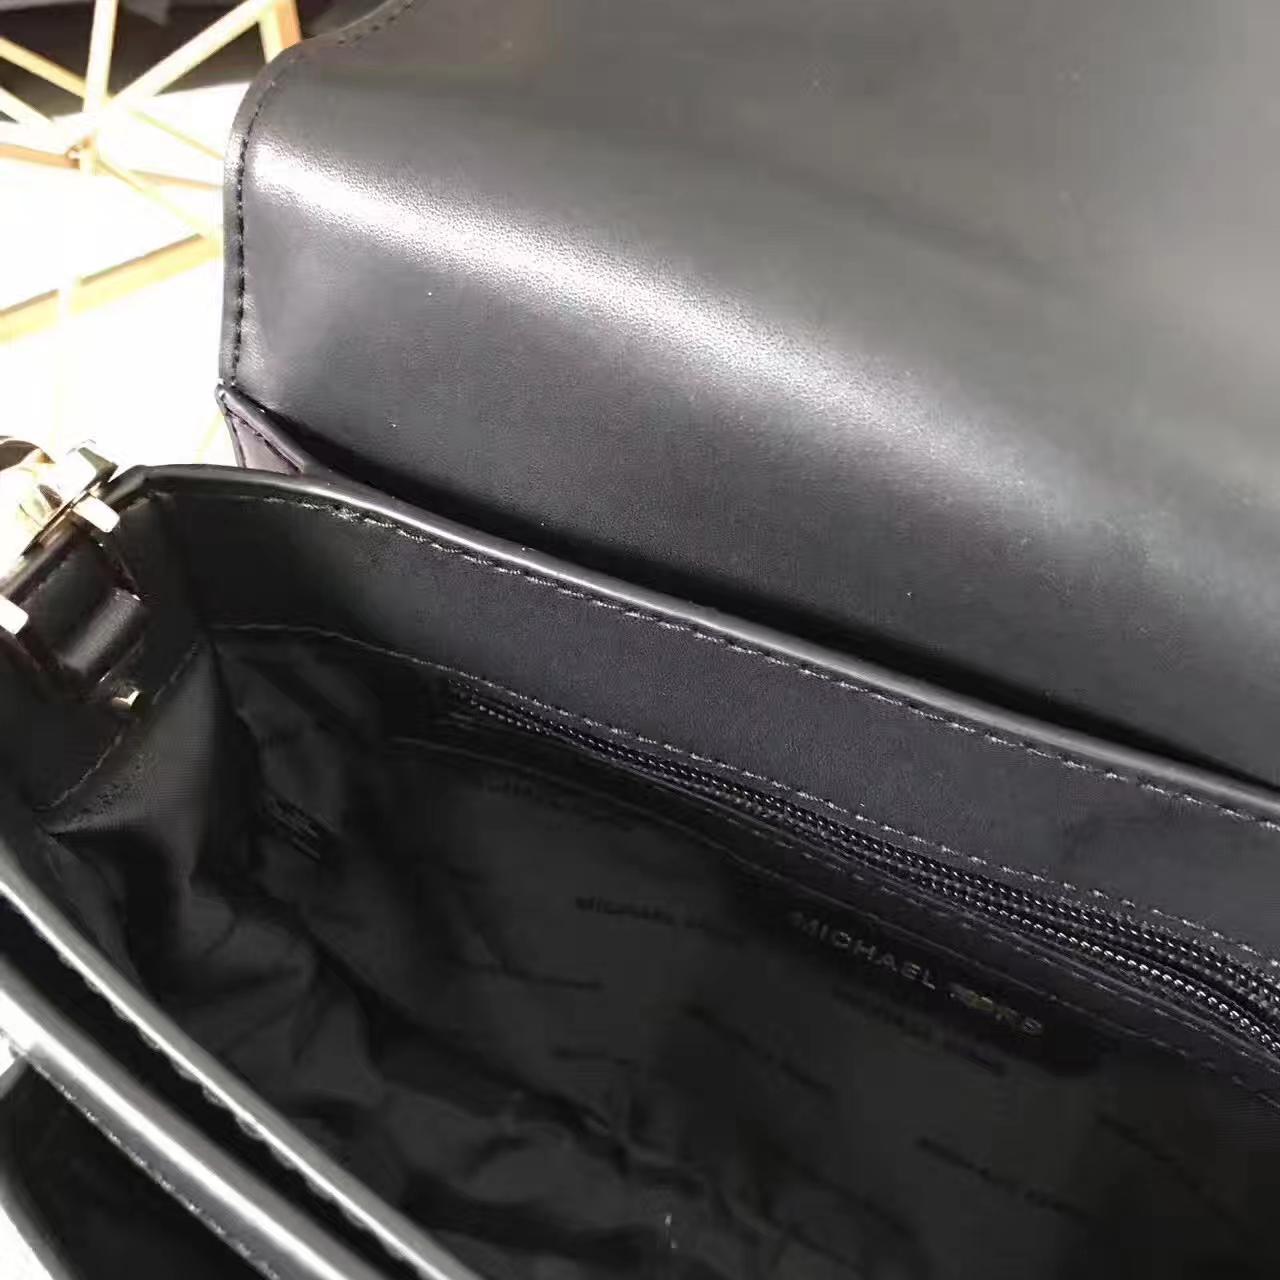 MK包包批发 杨幂同款SloaoEditor黑色进口纳帕牛皮单肩斜挎包23CM